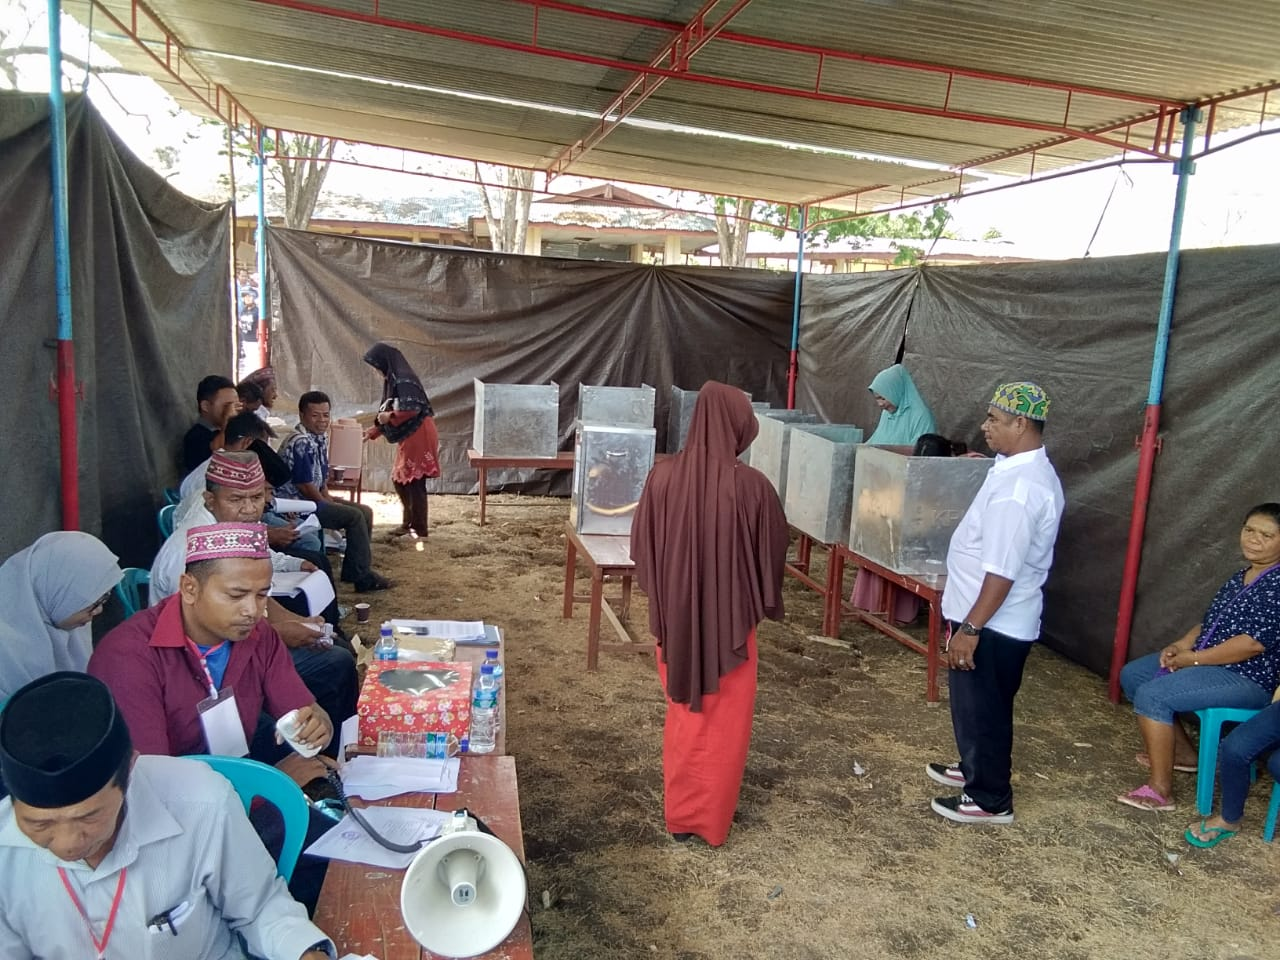 Blangko Hingga 1045 Suara, Cakades Nomor 4 Gugat Panitia Desa Gorontalo